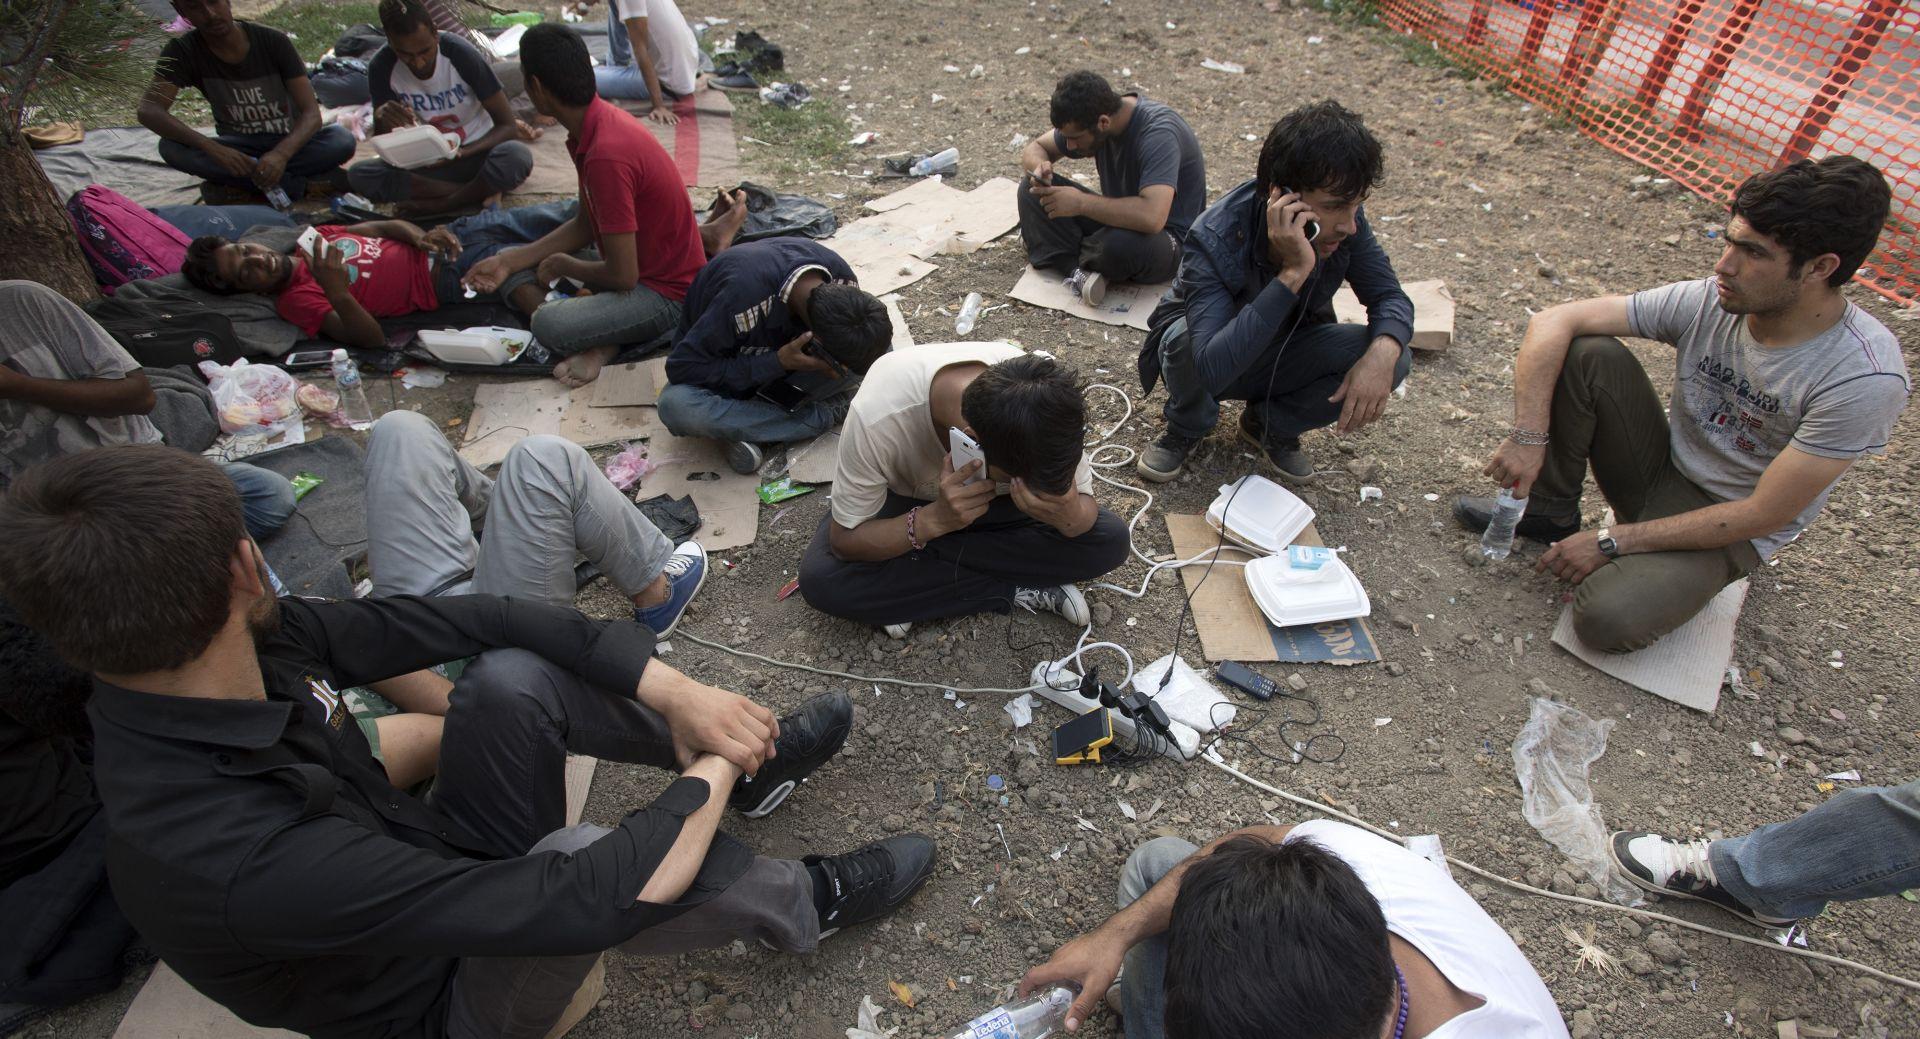 U blizini hrvatsko-slovenske granice zatečeno 50-ak ilegalnih migranata